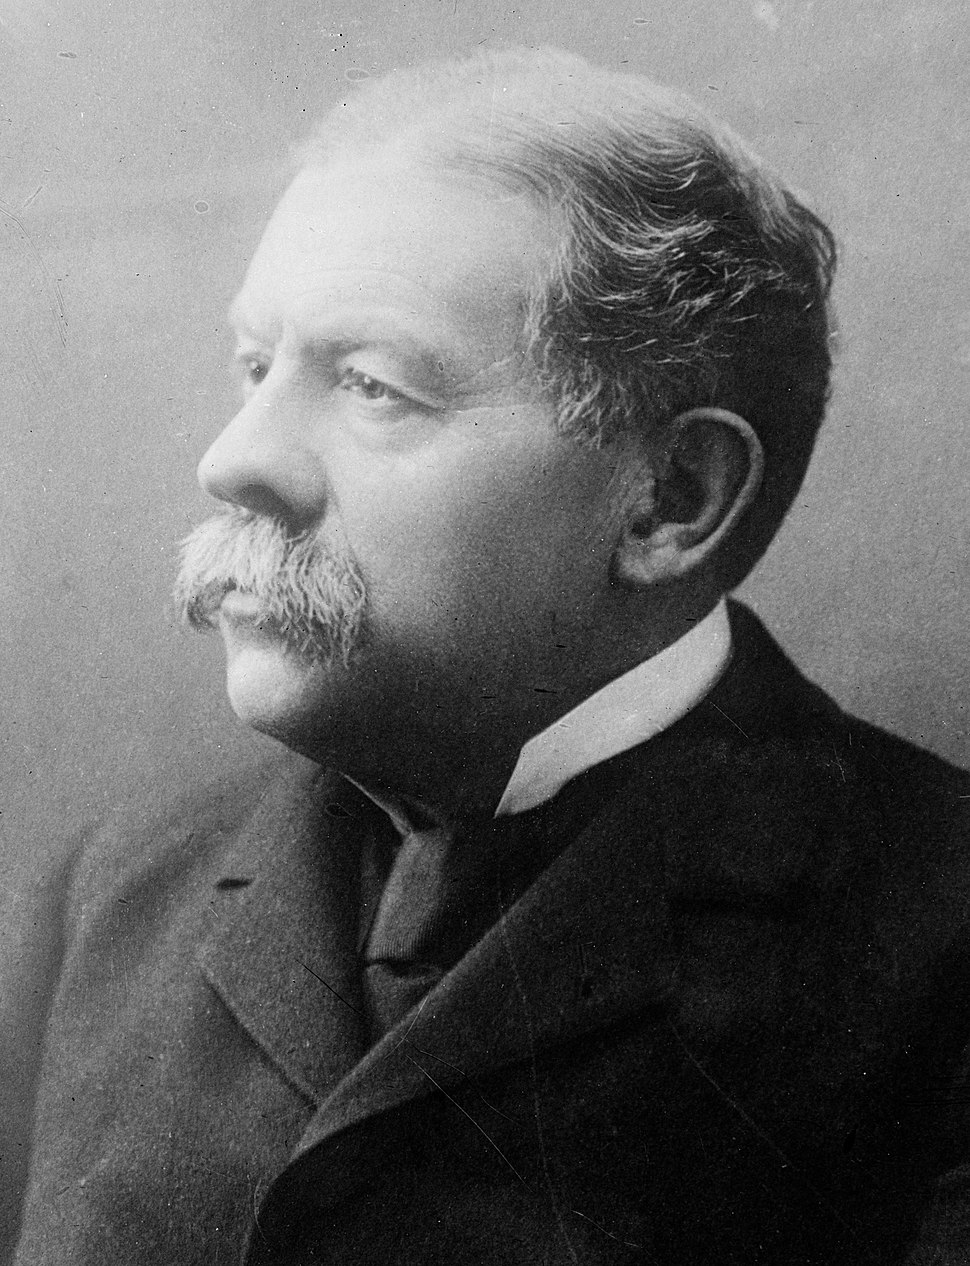 Richard Olney, Bain bw photo portrait, 1913.jpg